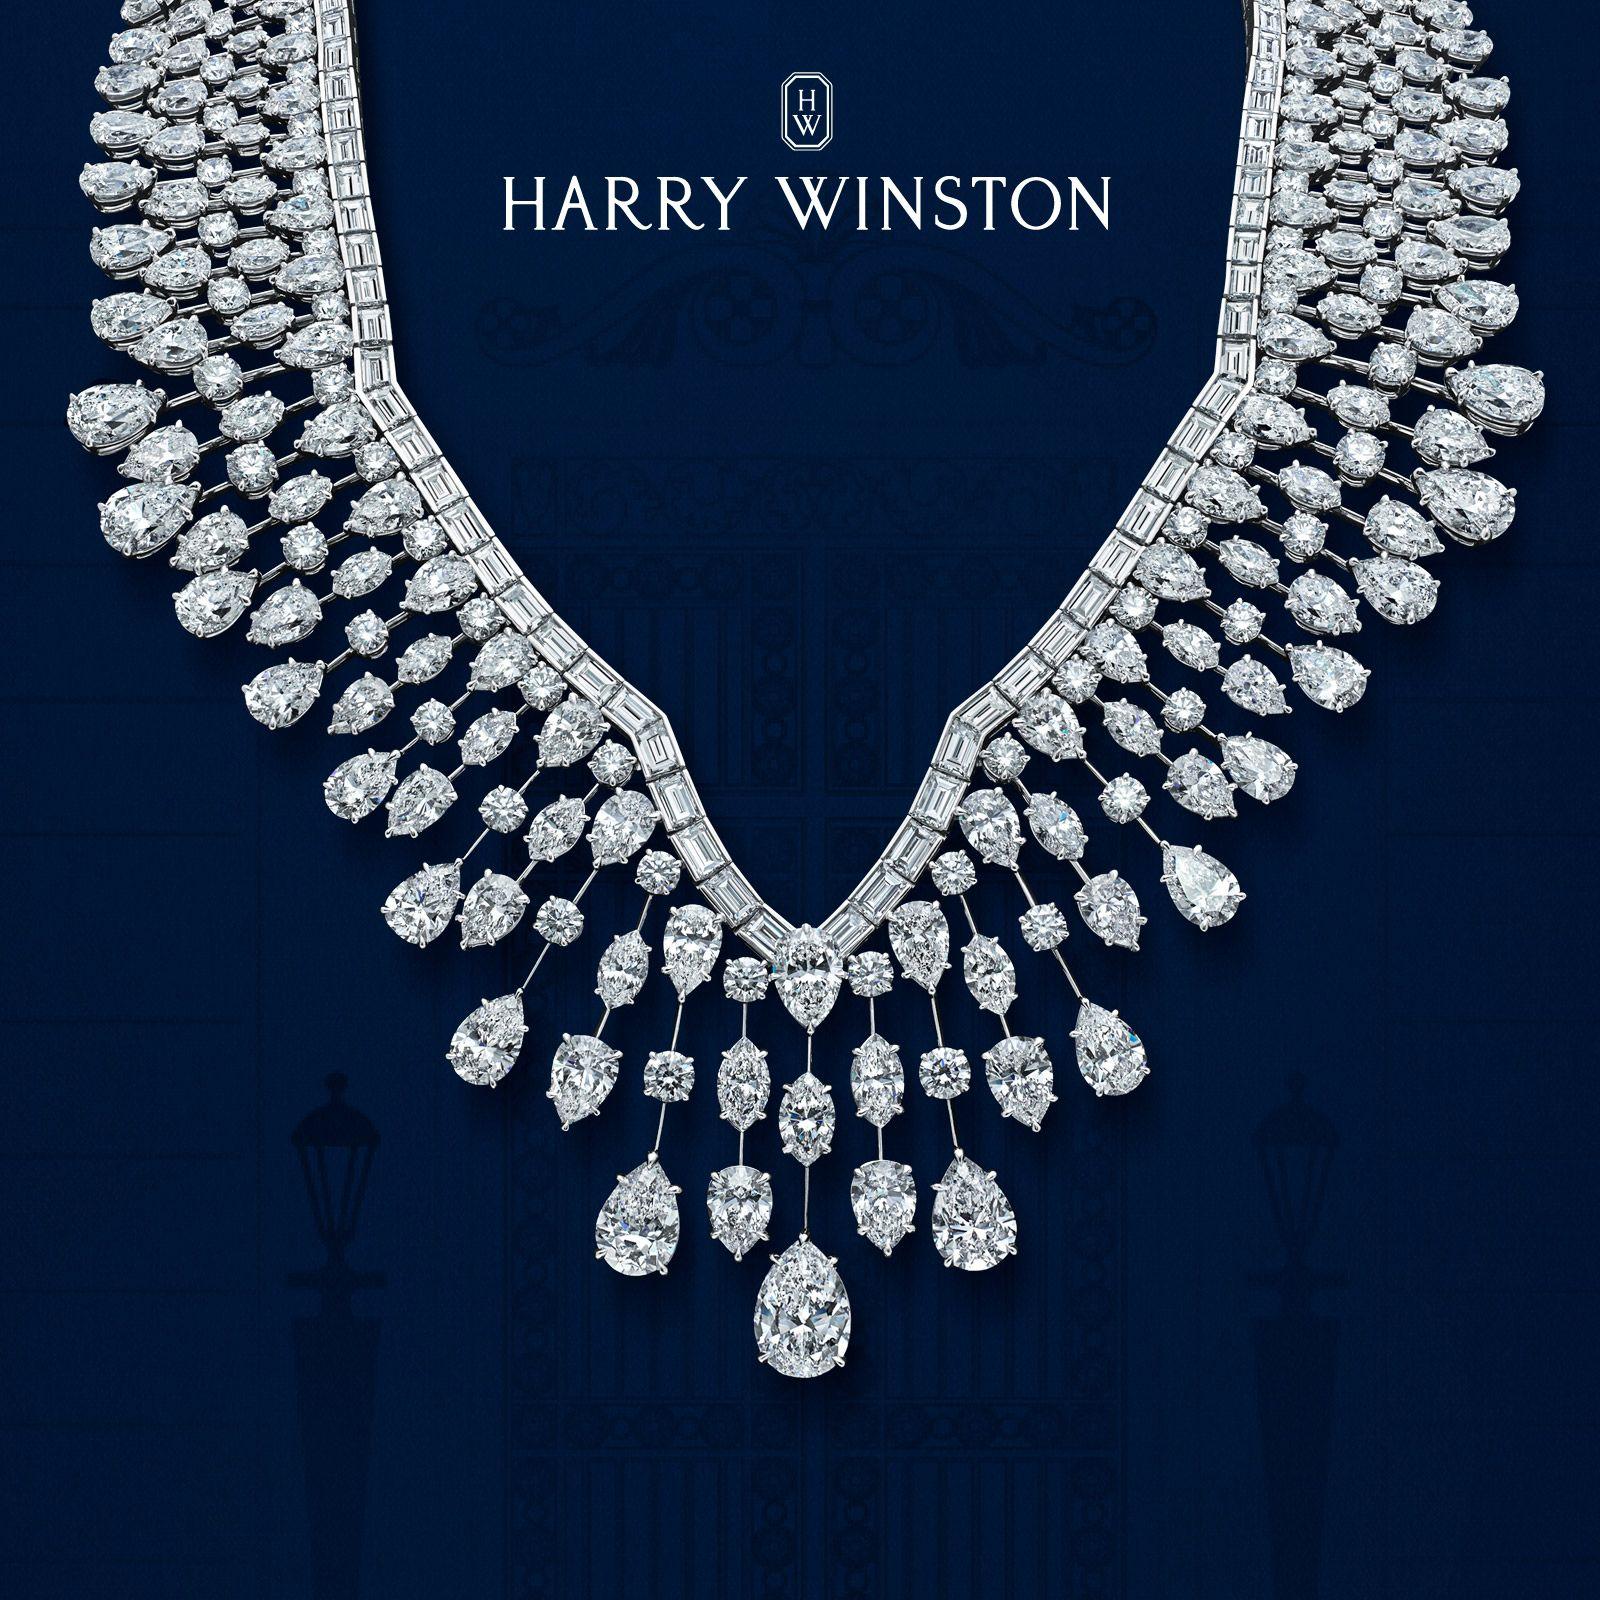 Harry Winston - best jewellery brands